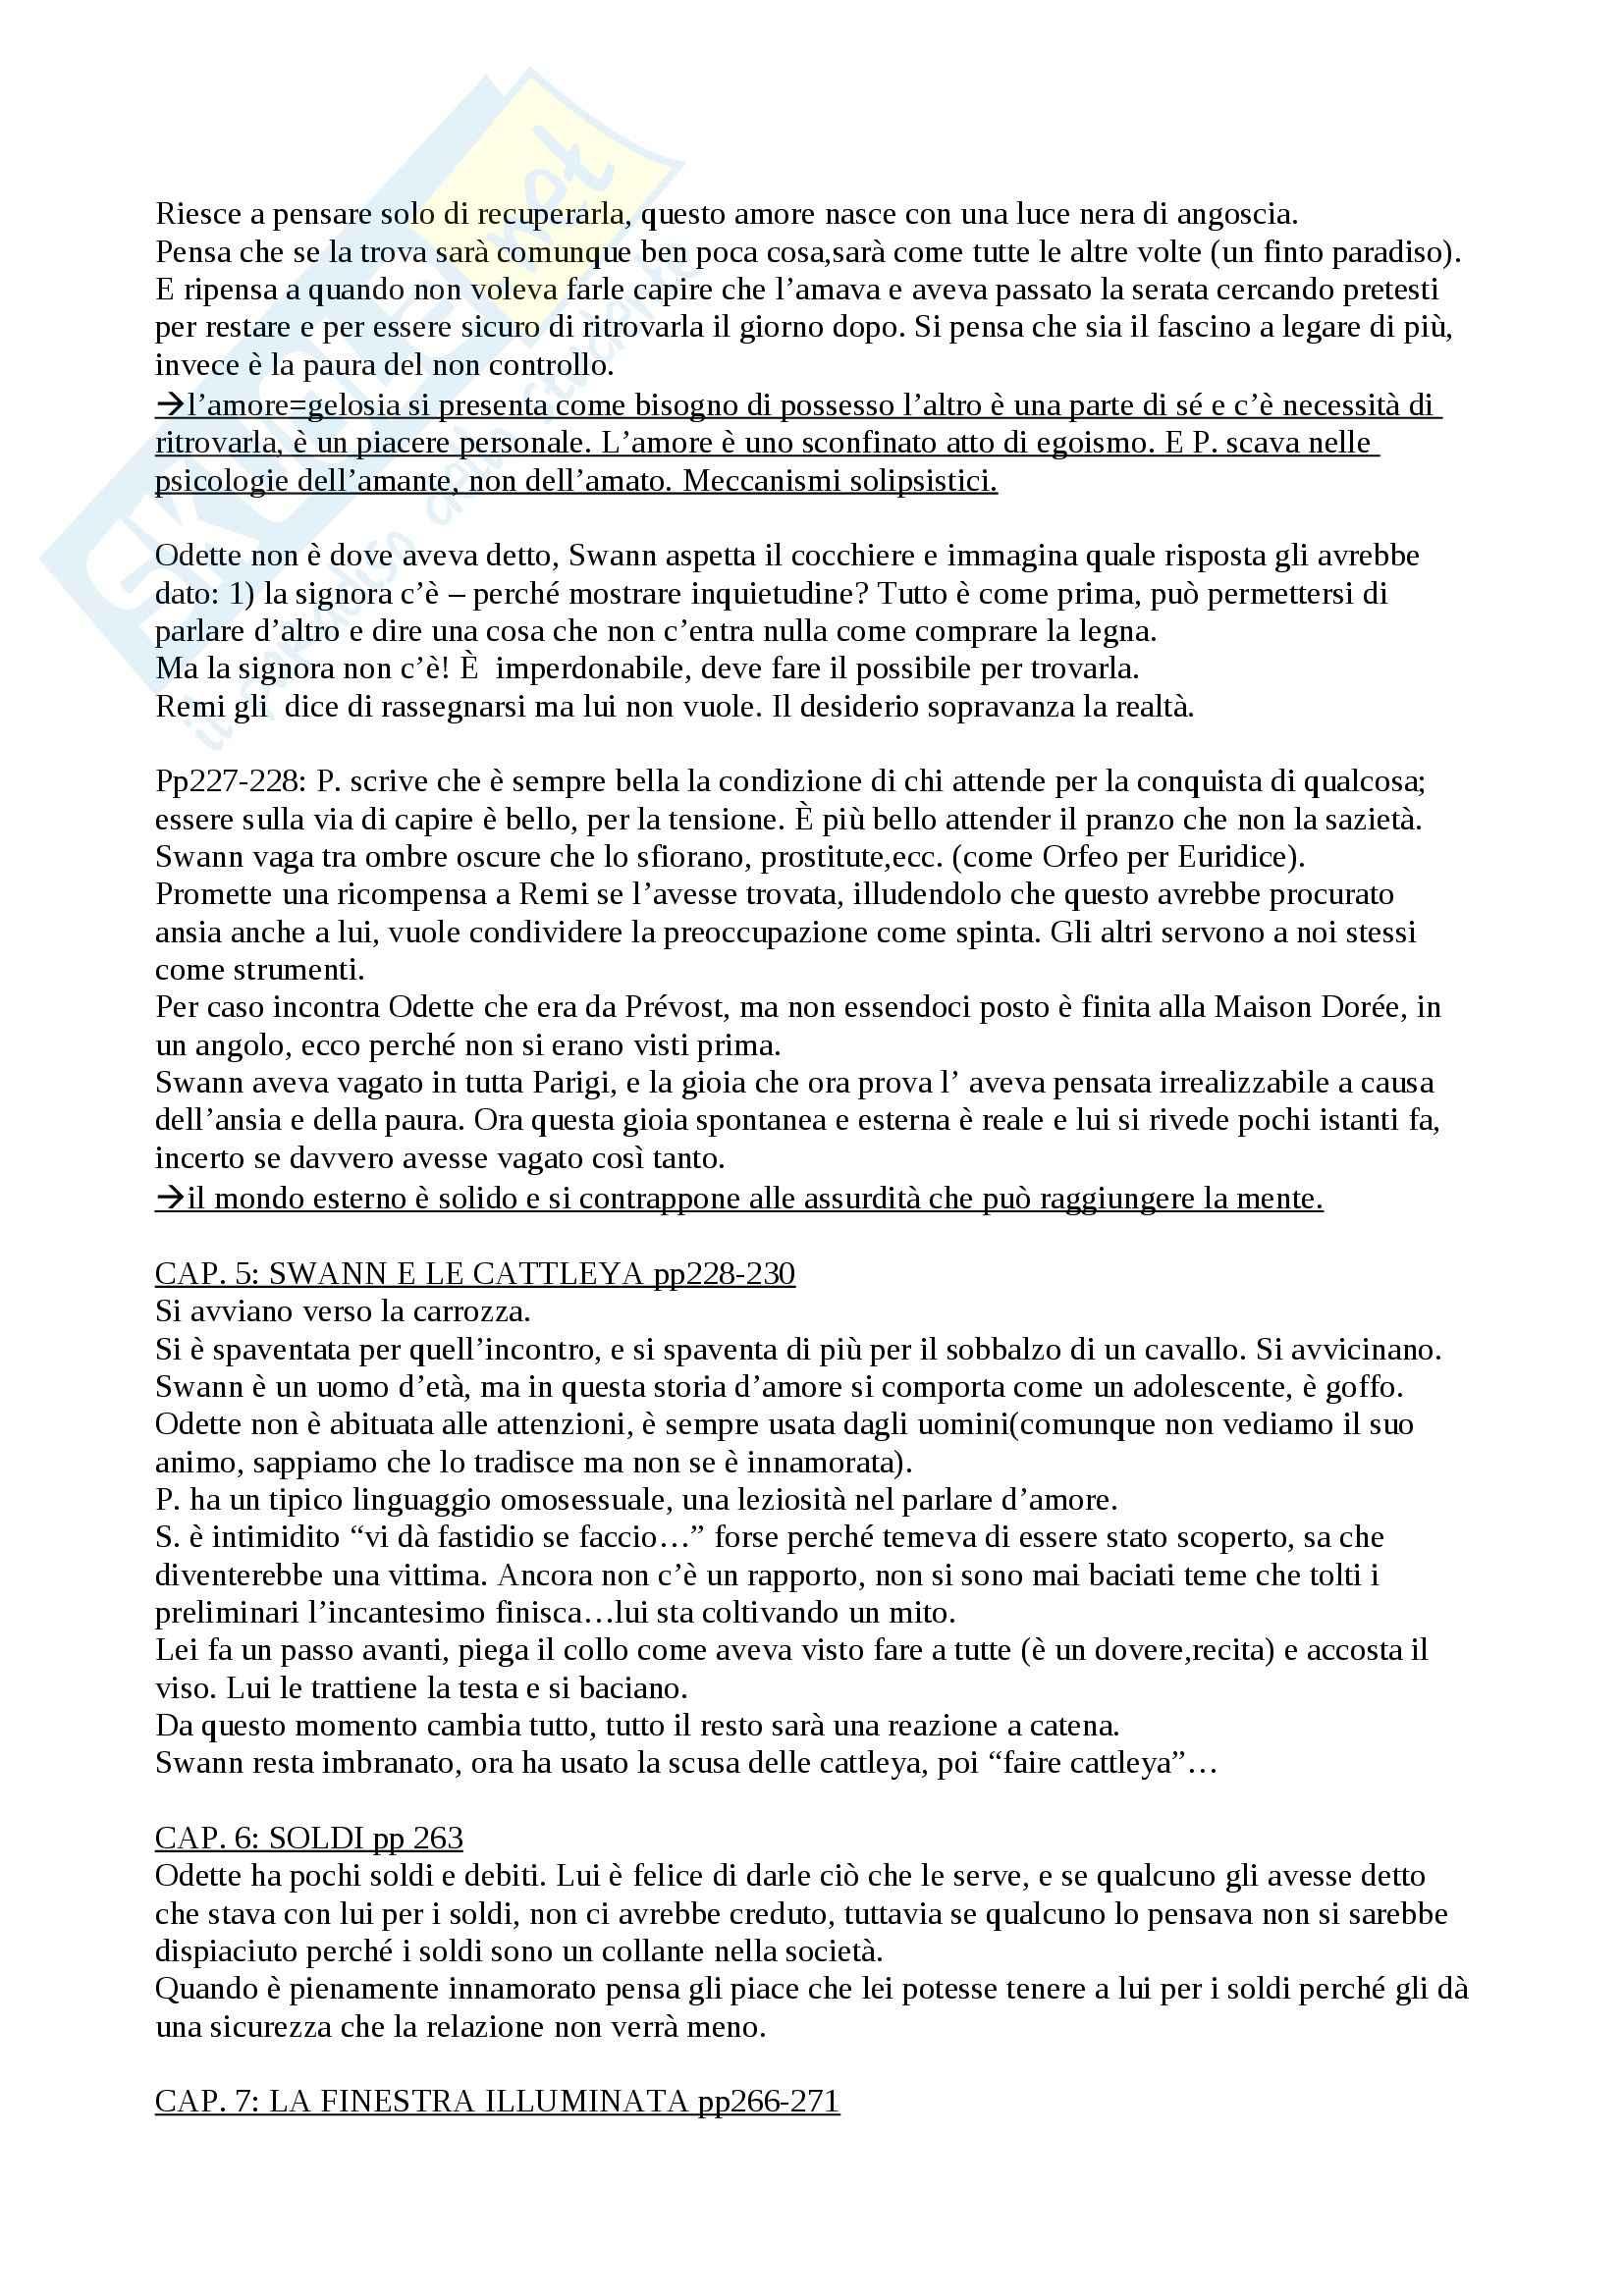 Opere di Proust, Letteratura francese Pag. 11